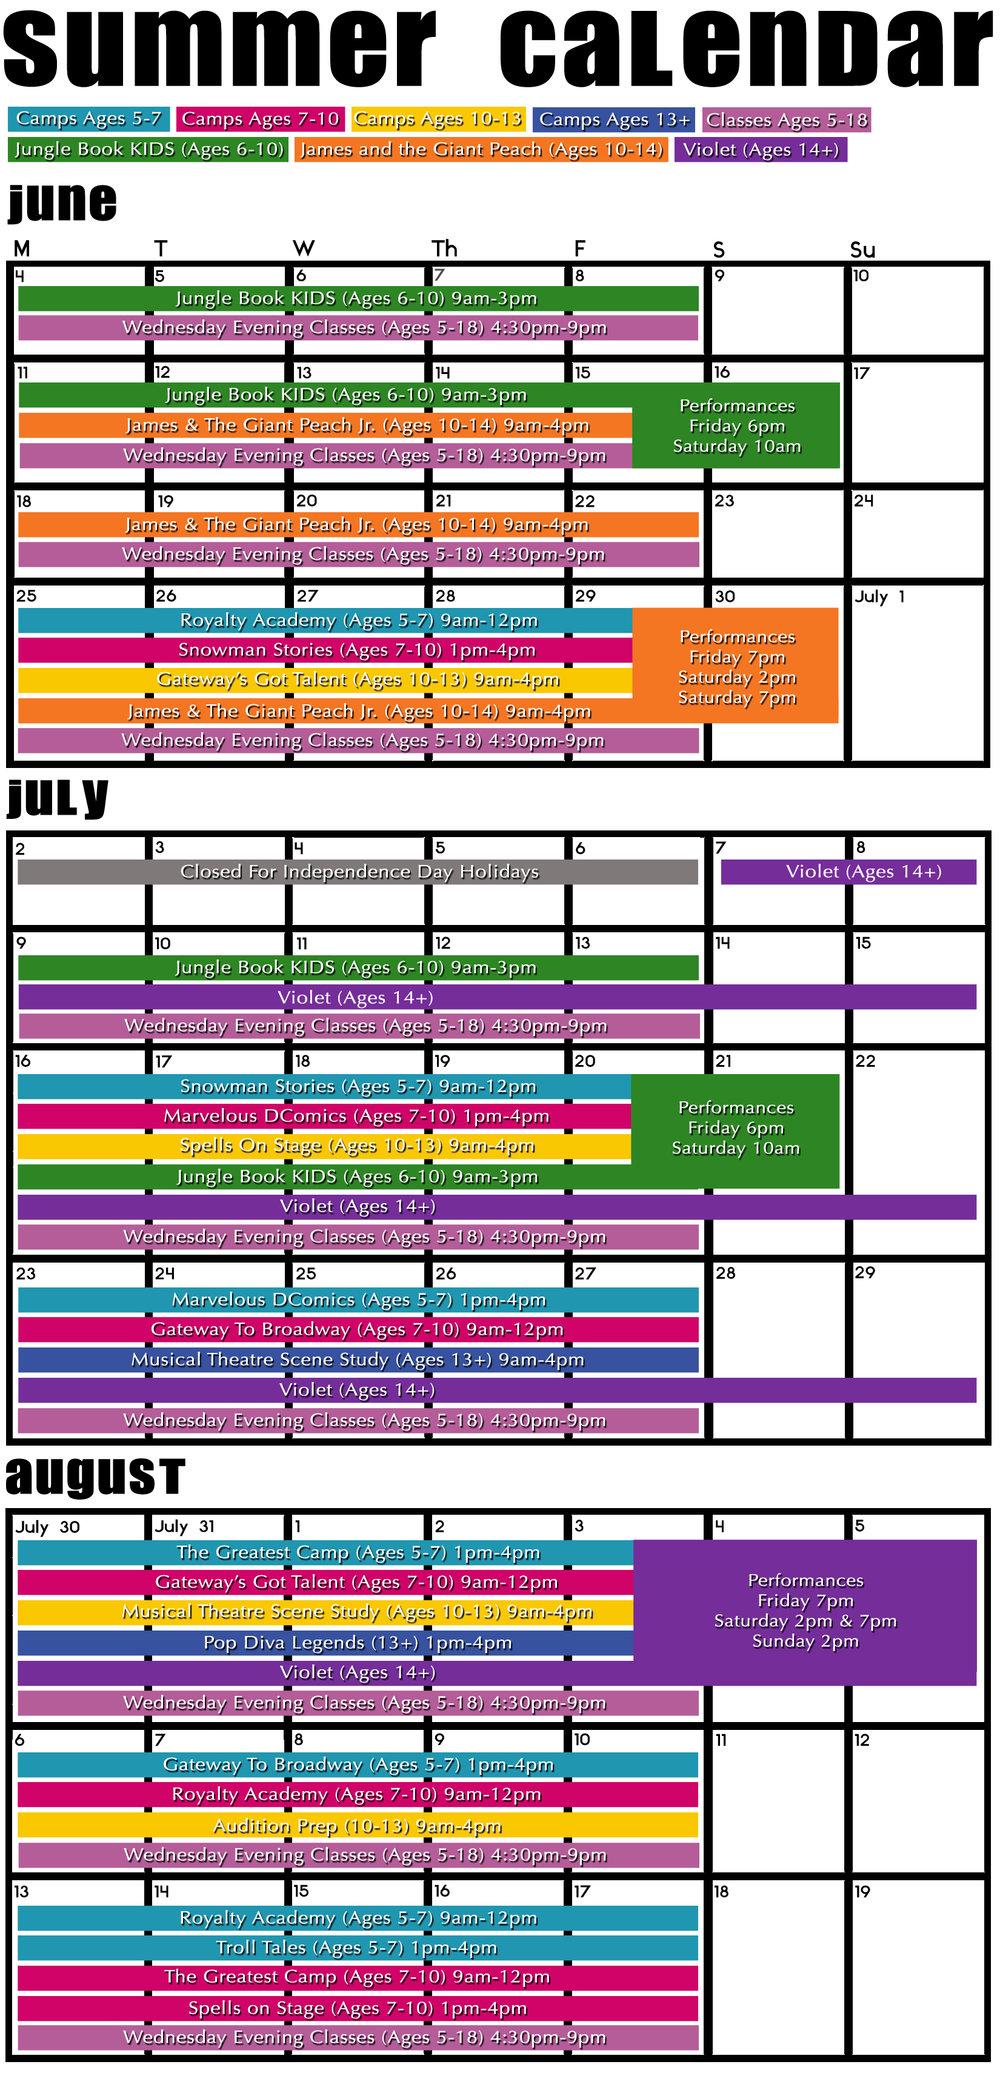 summer 2018 calendar.jpg